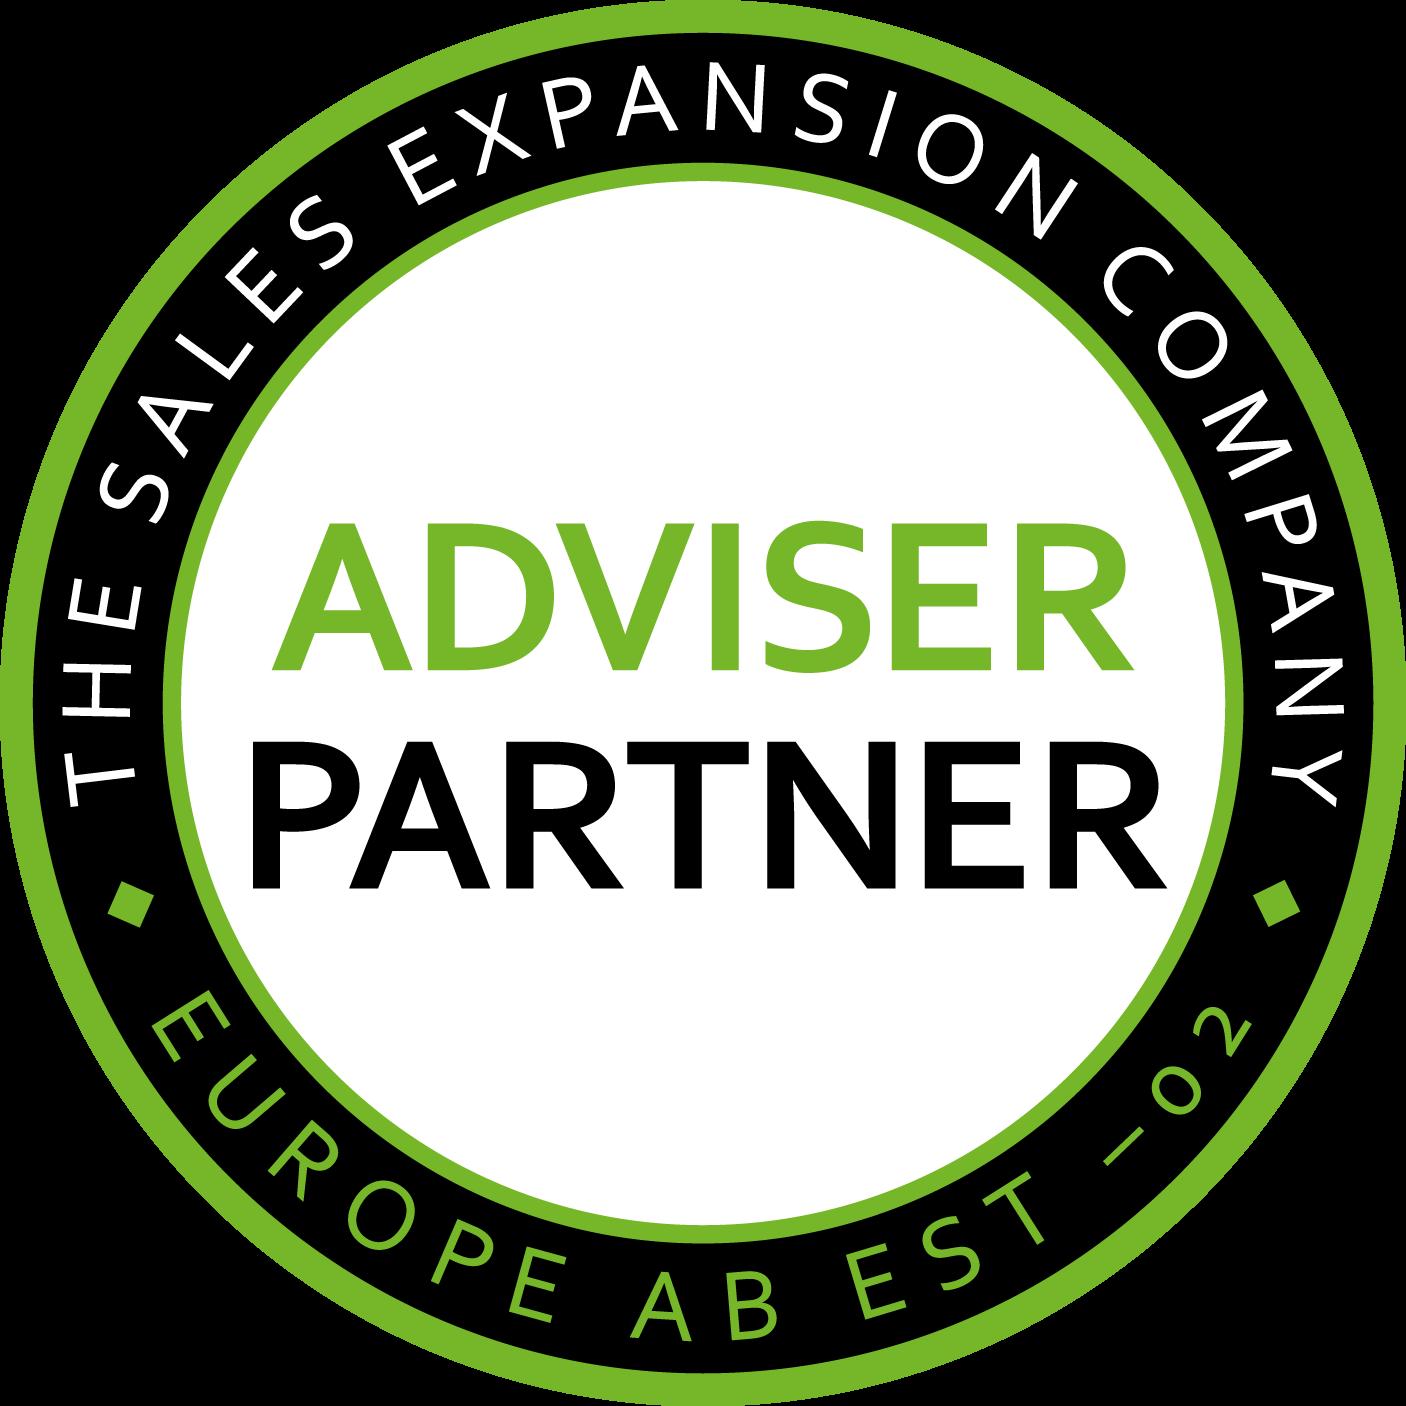 Adviser Partner logotyp